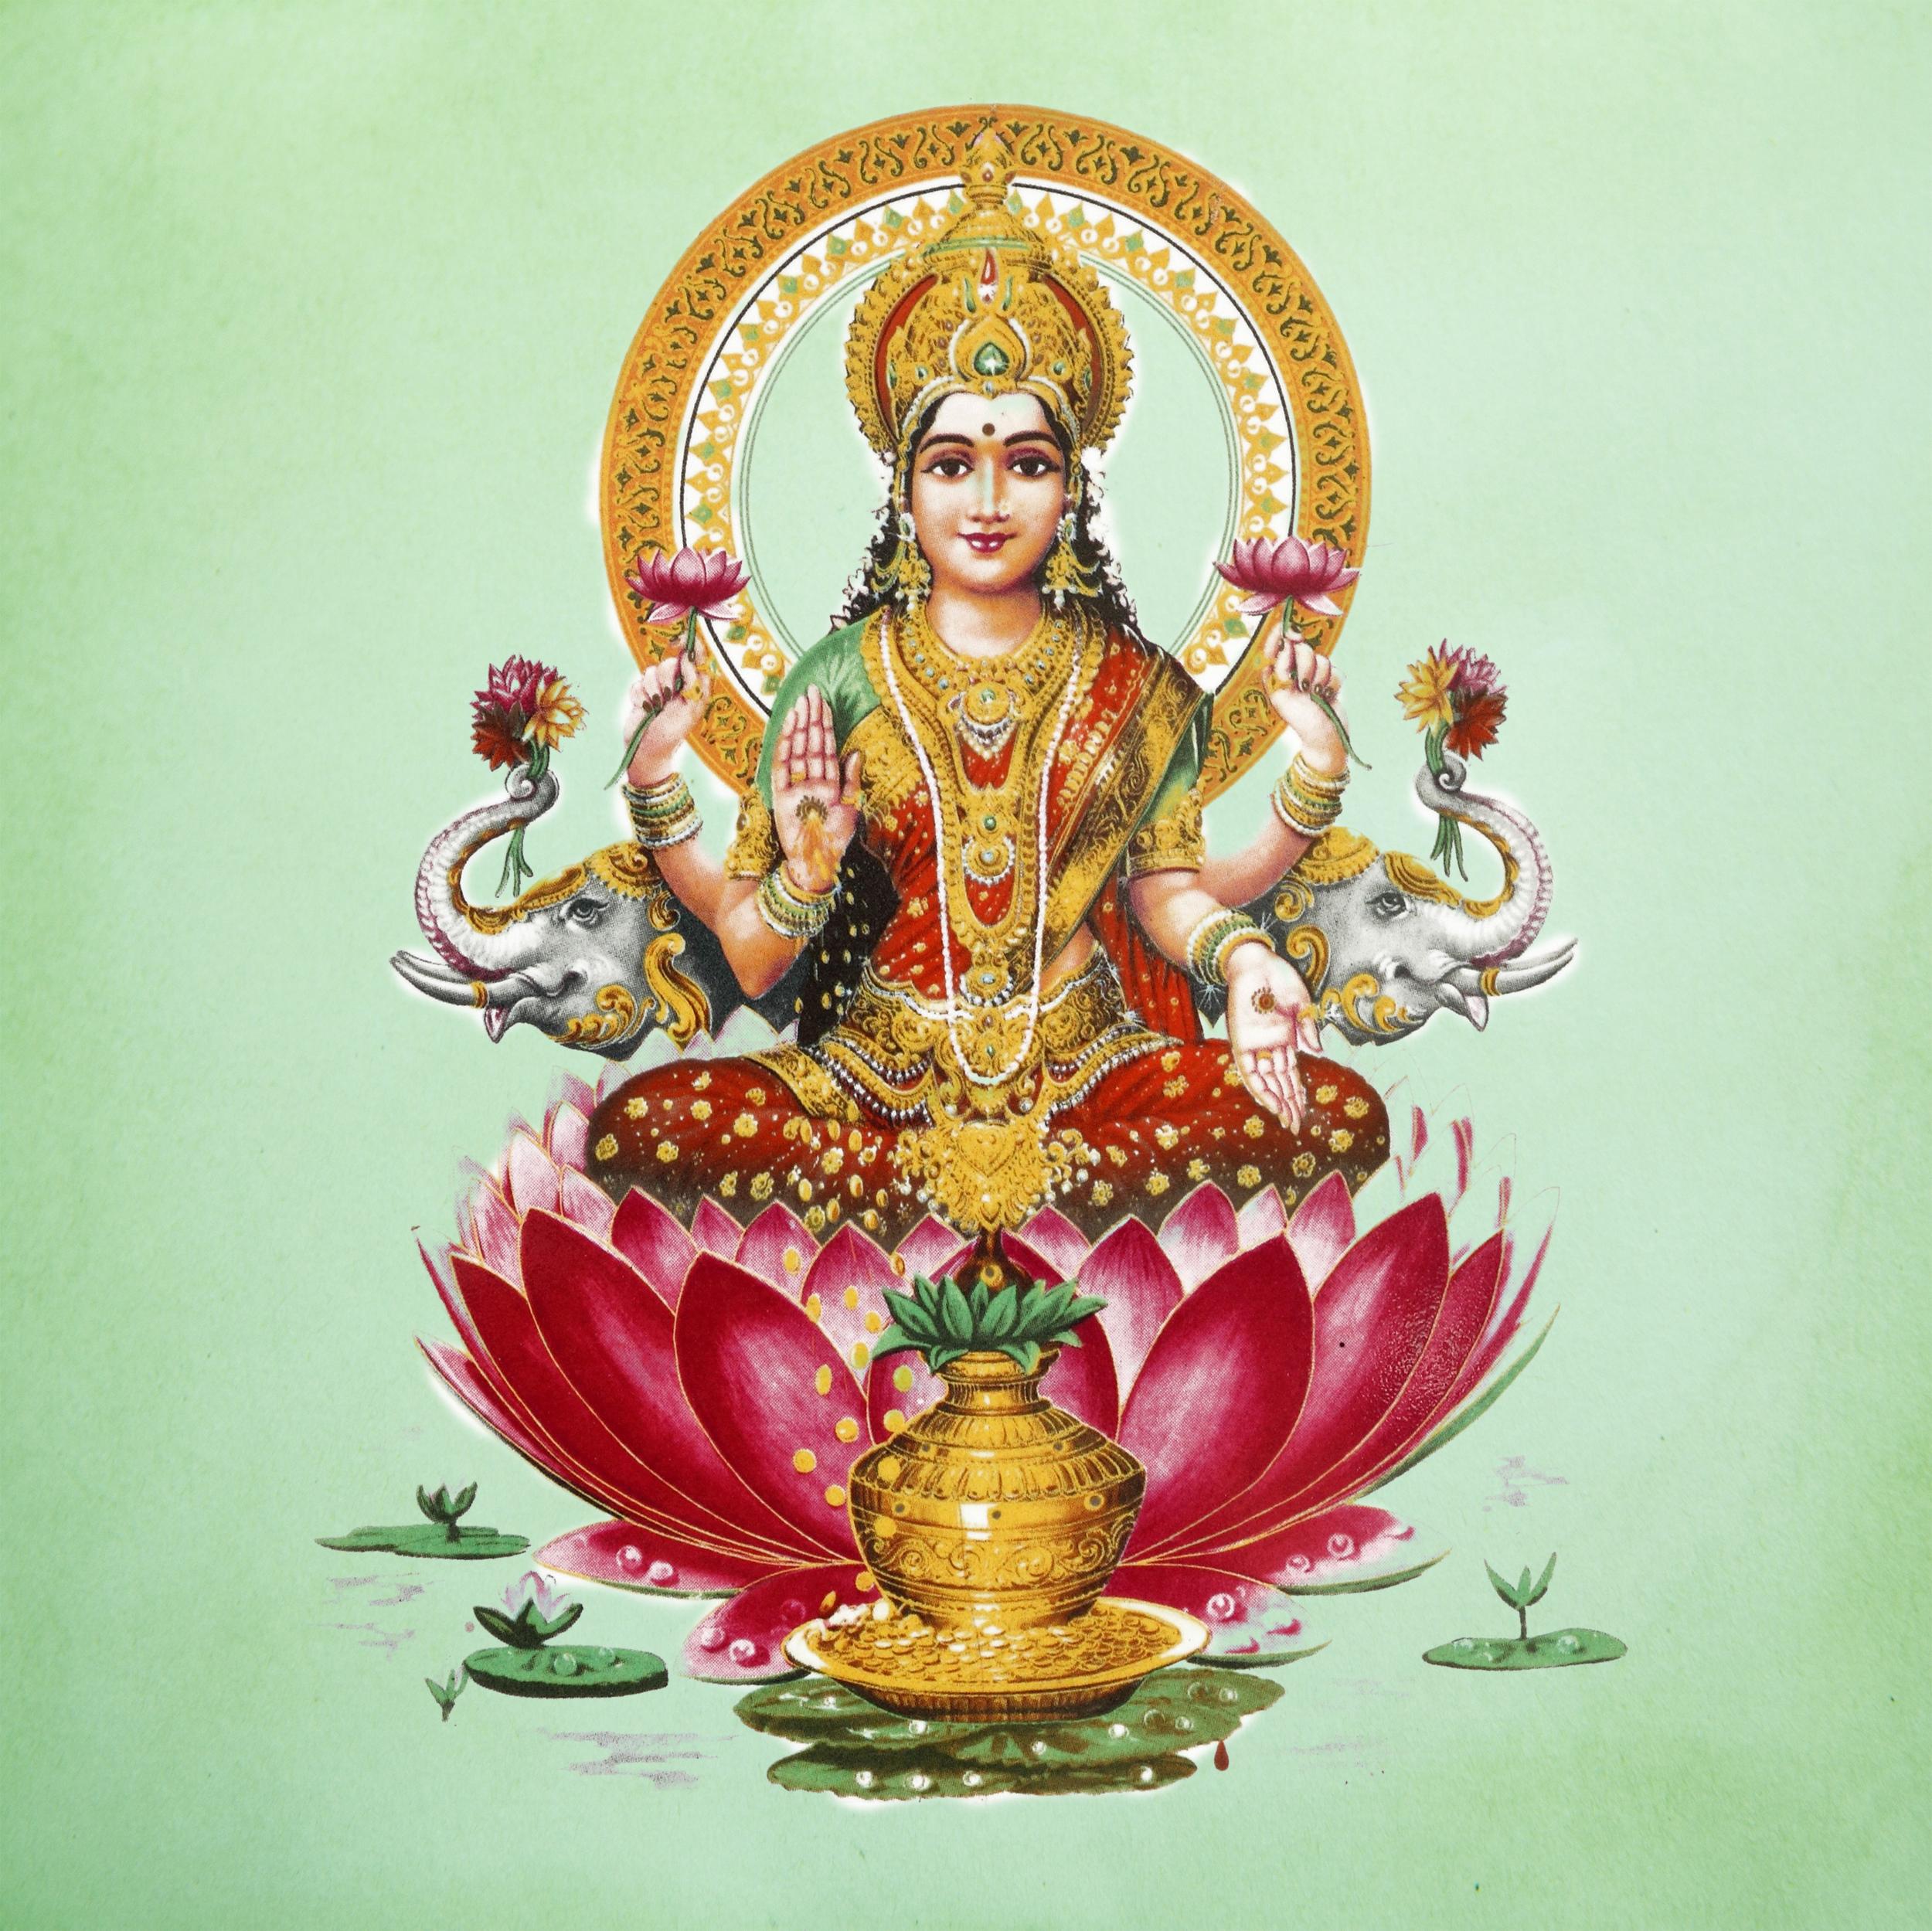 Lakshmi - goddess of wealth and harmony